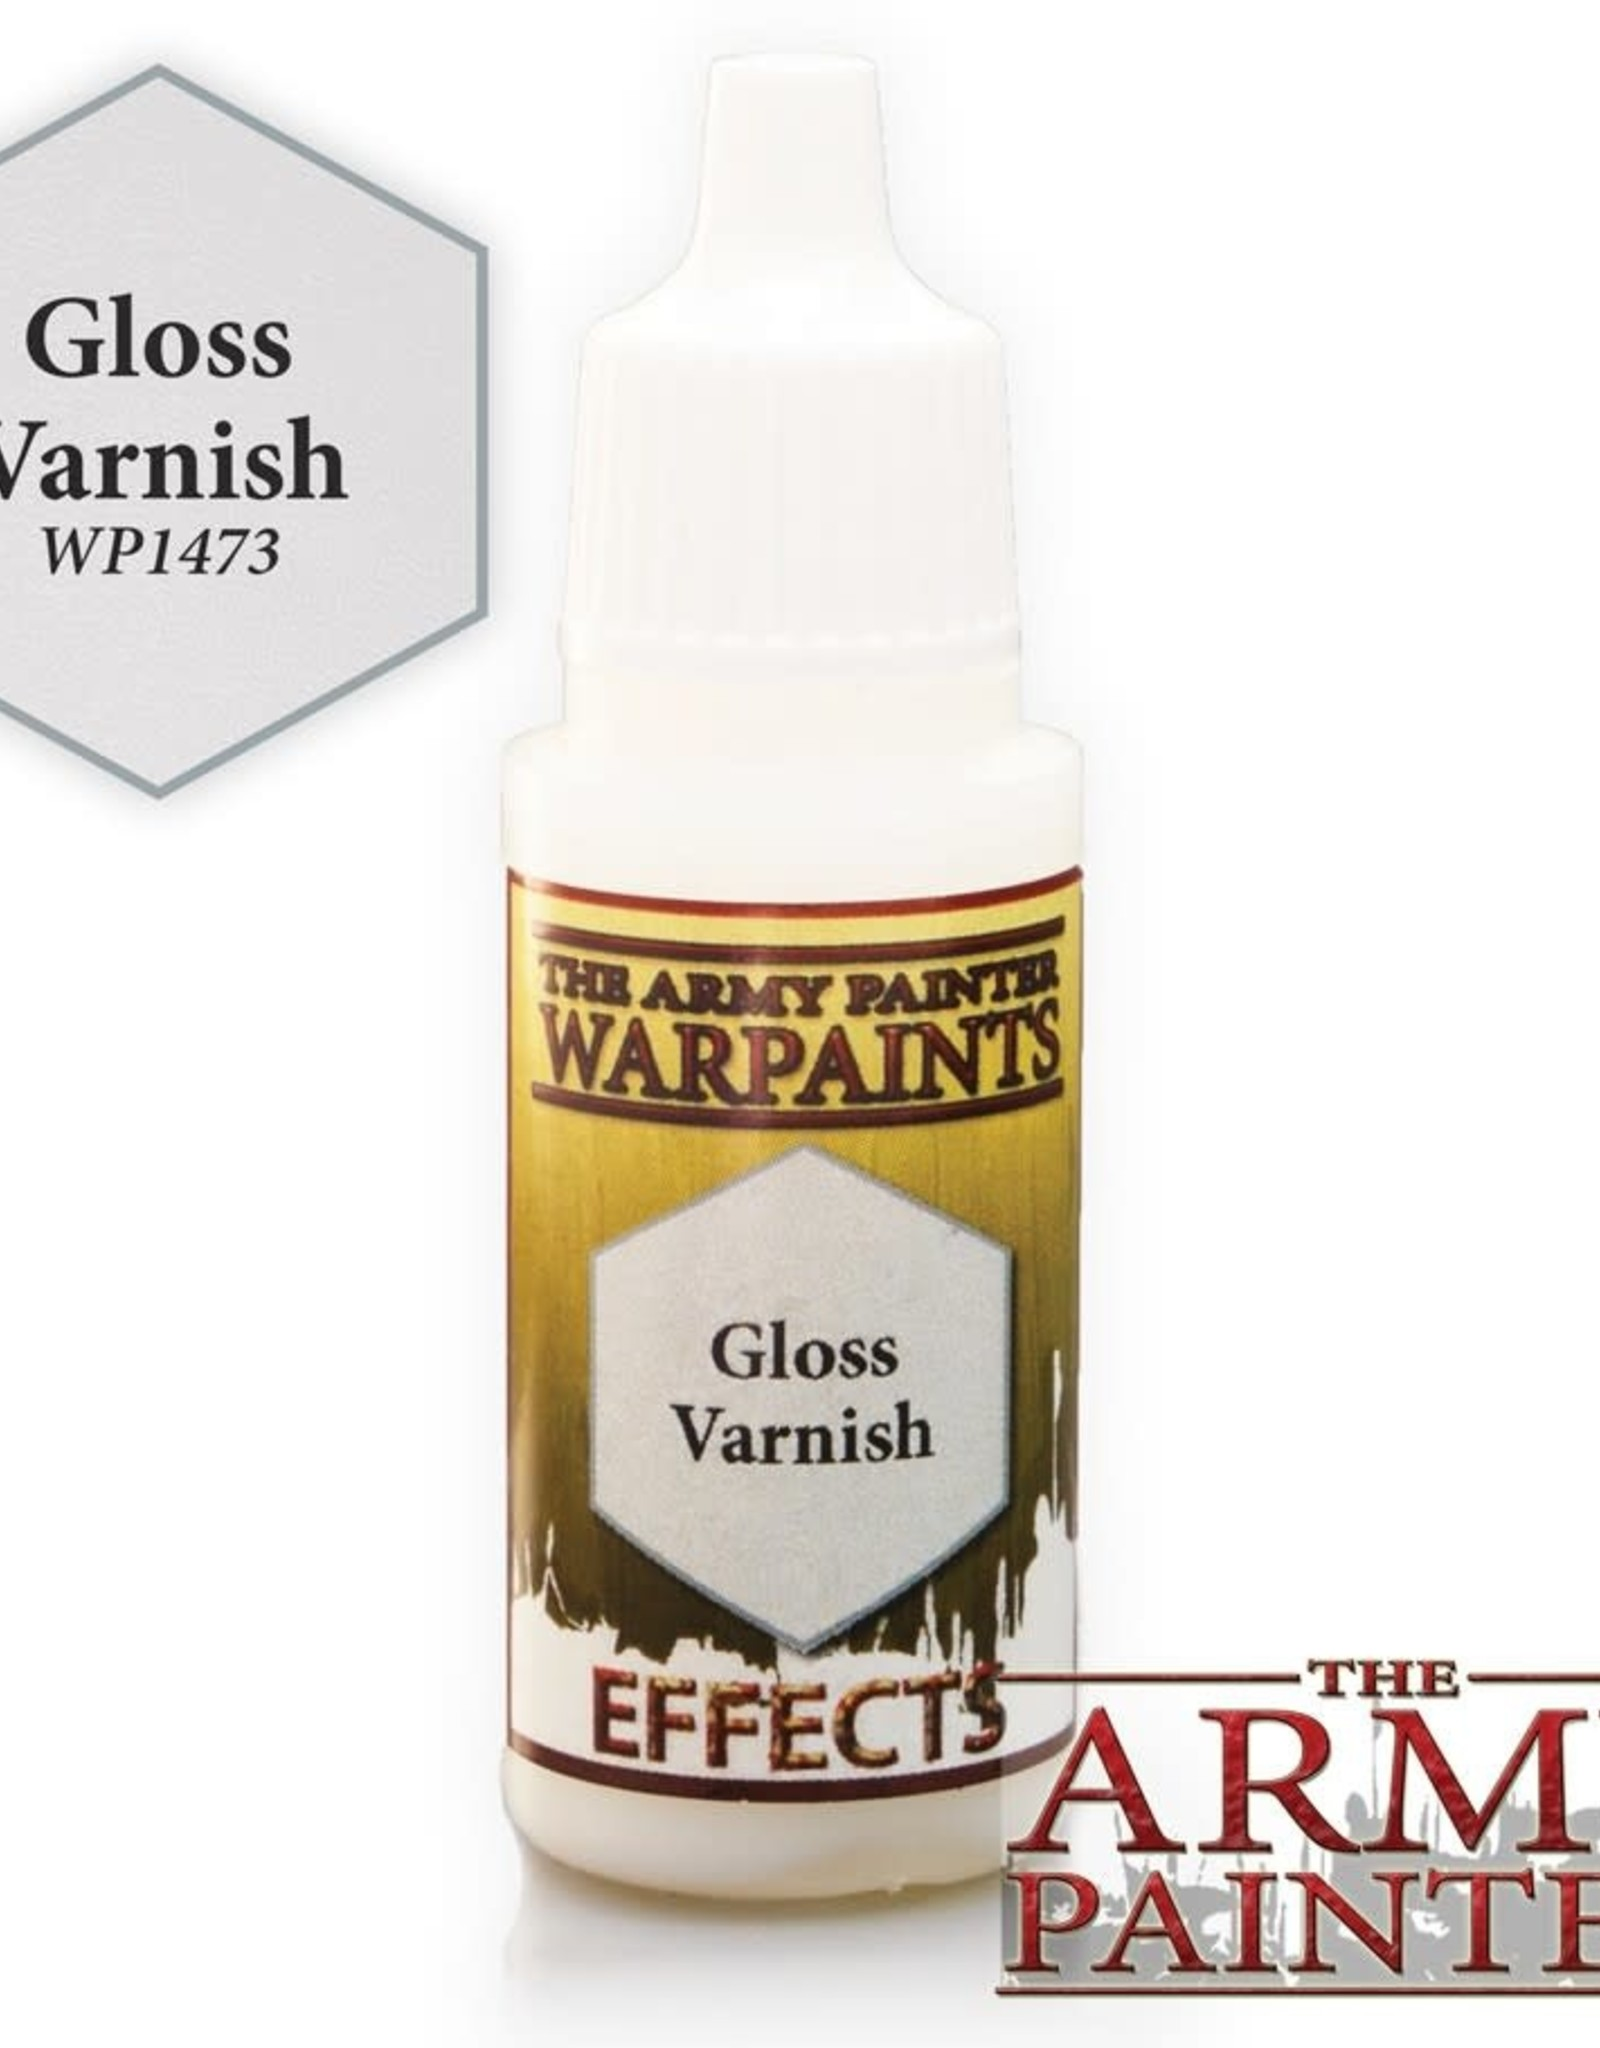 Warpaints: Gloss Varnish